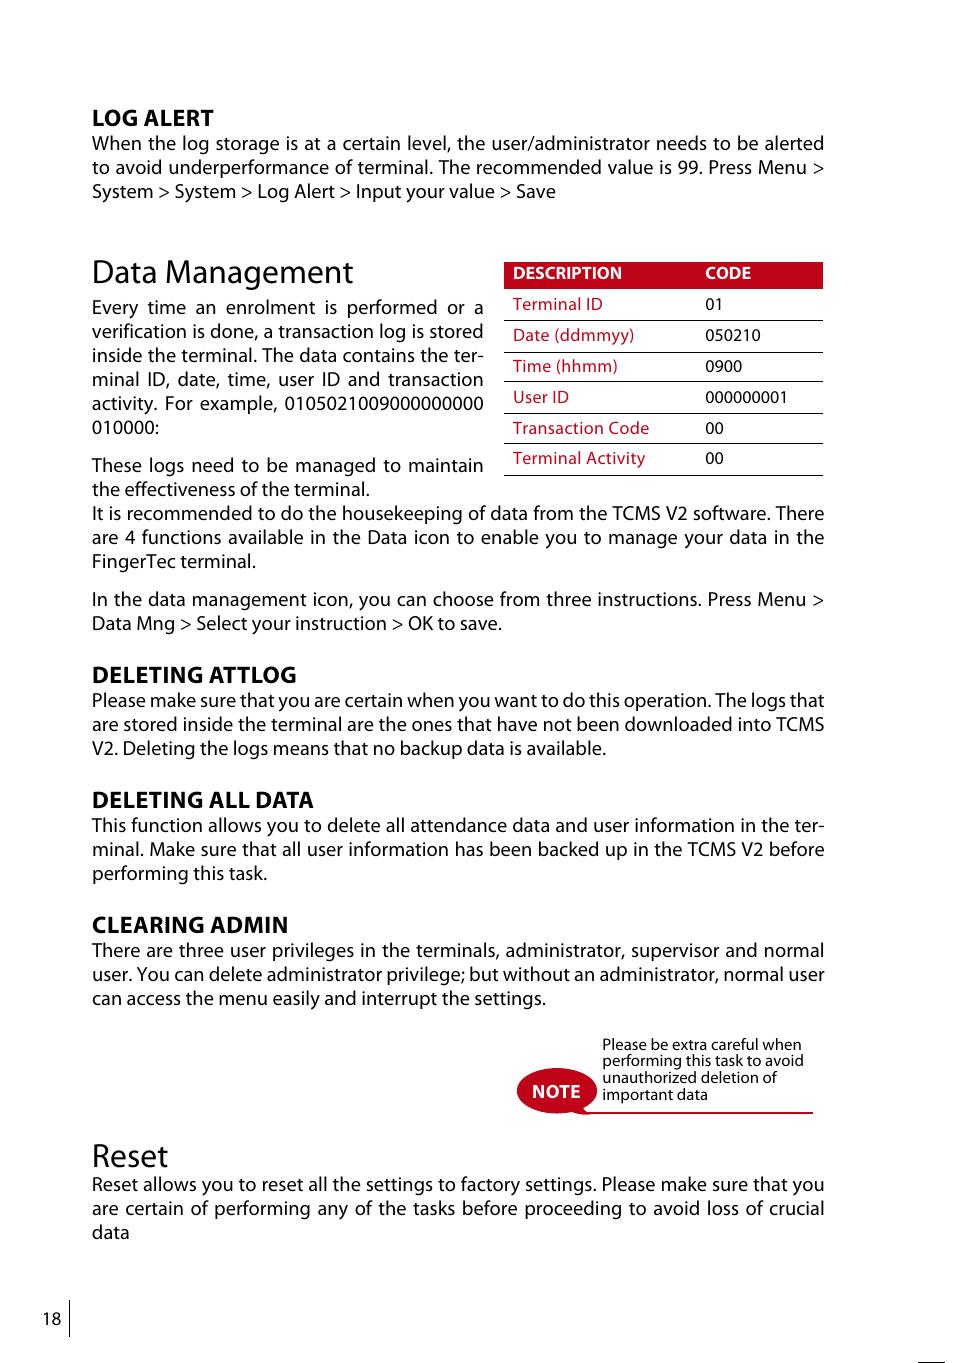 Data management, Reset, Log alert | FingerTec TA500 Manual